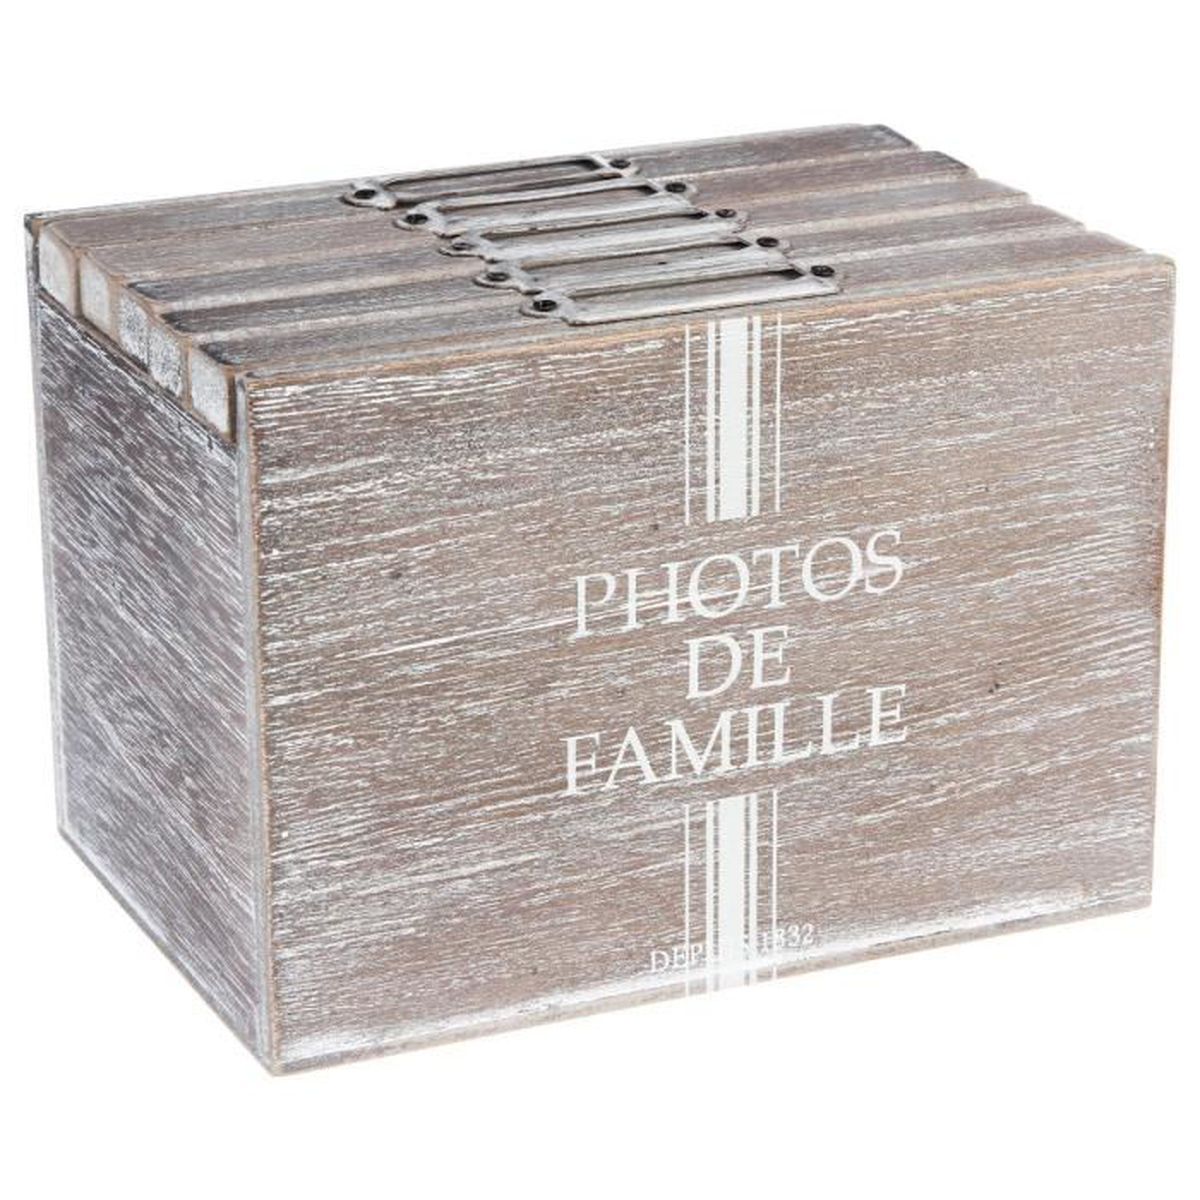 boite rangement photo achat vente boite rangement. Black Bedroom Furniture Sets. Home Design Ideas